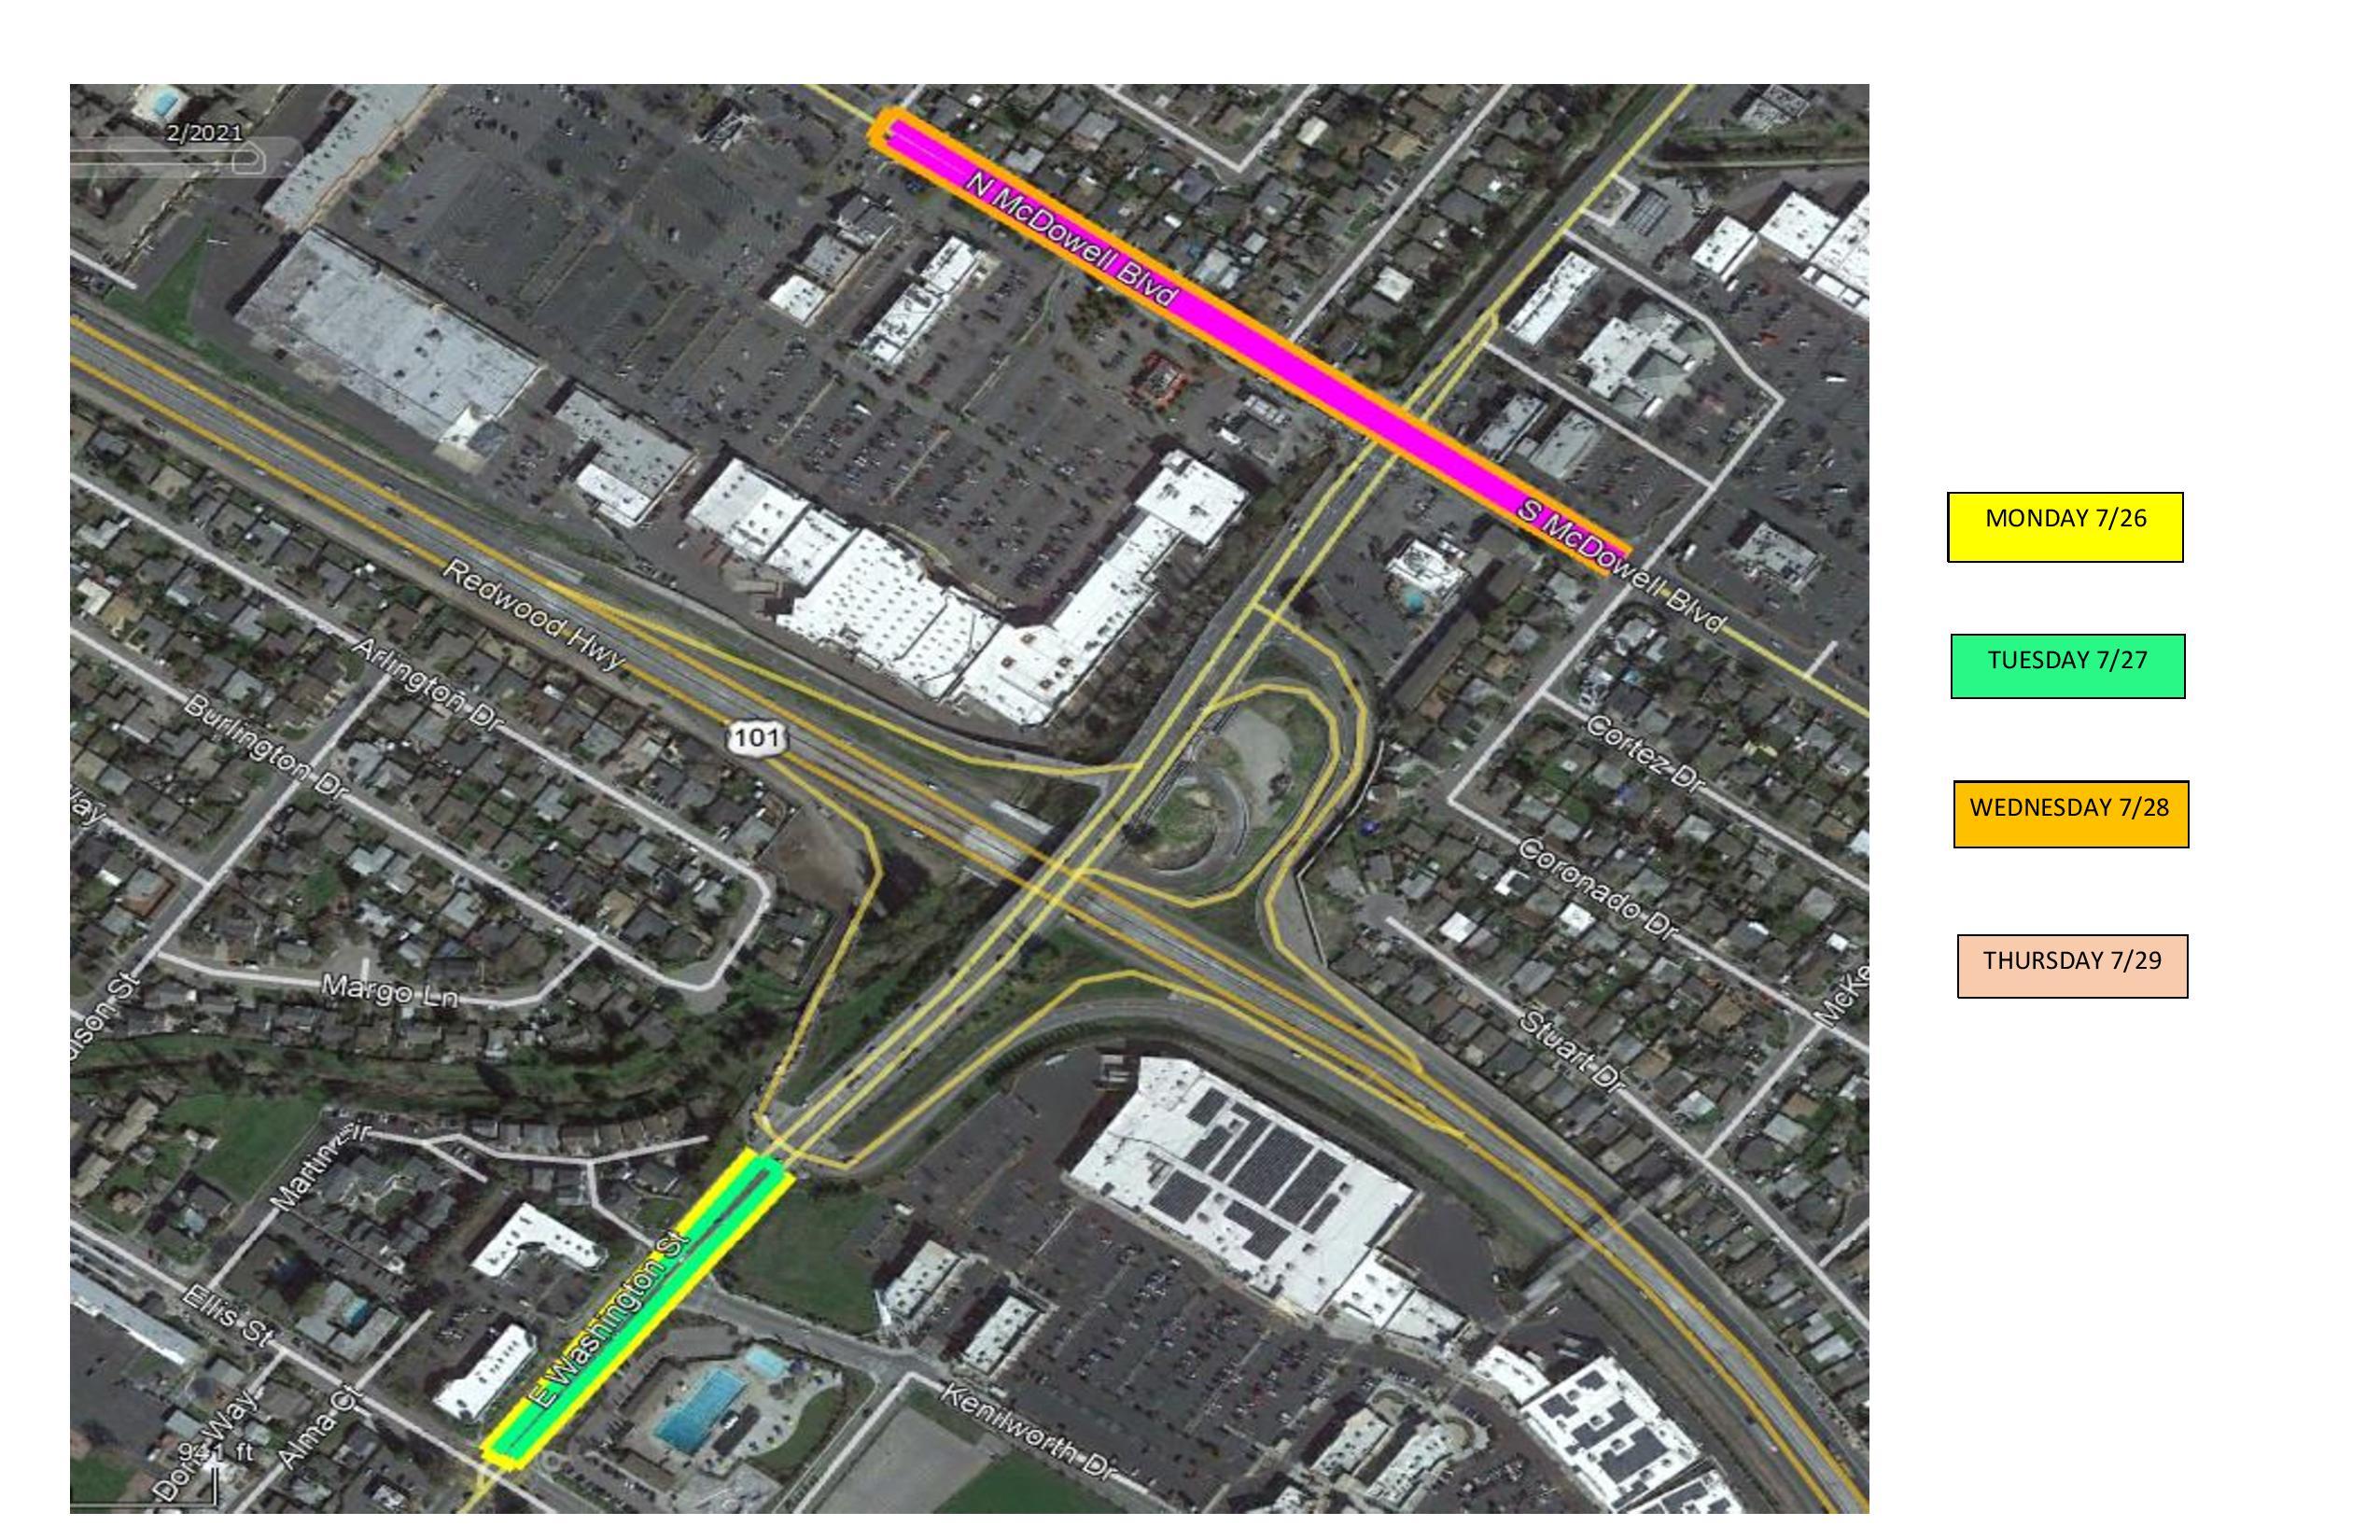 Pavement Map 1 7_26 thru 7_29